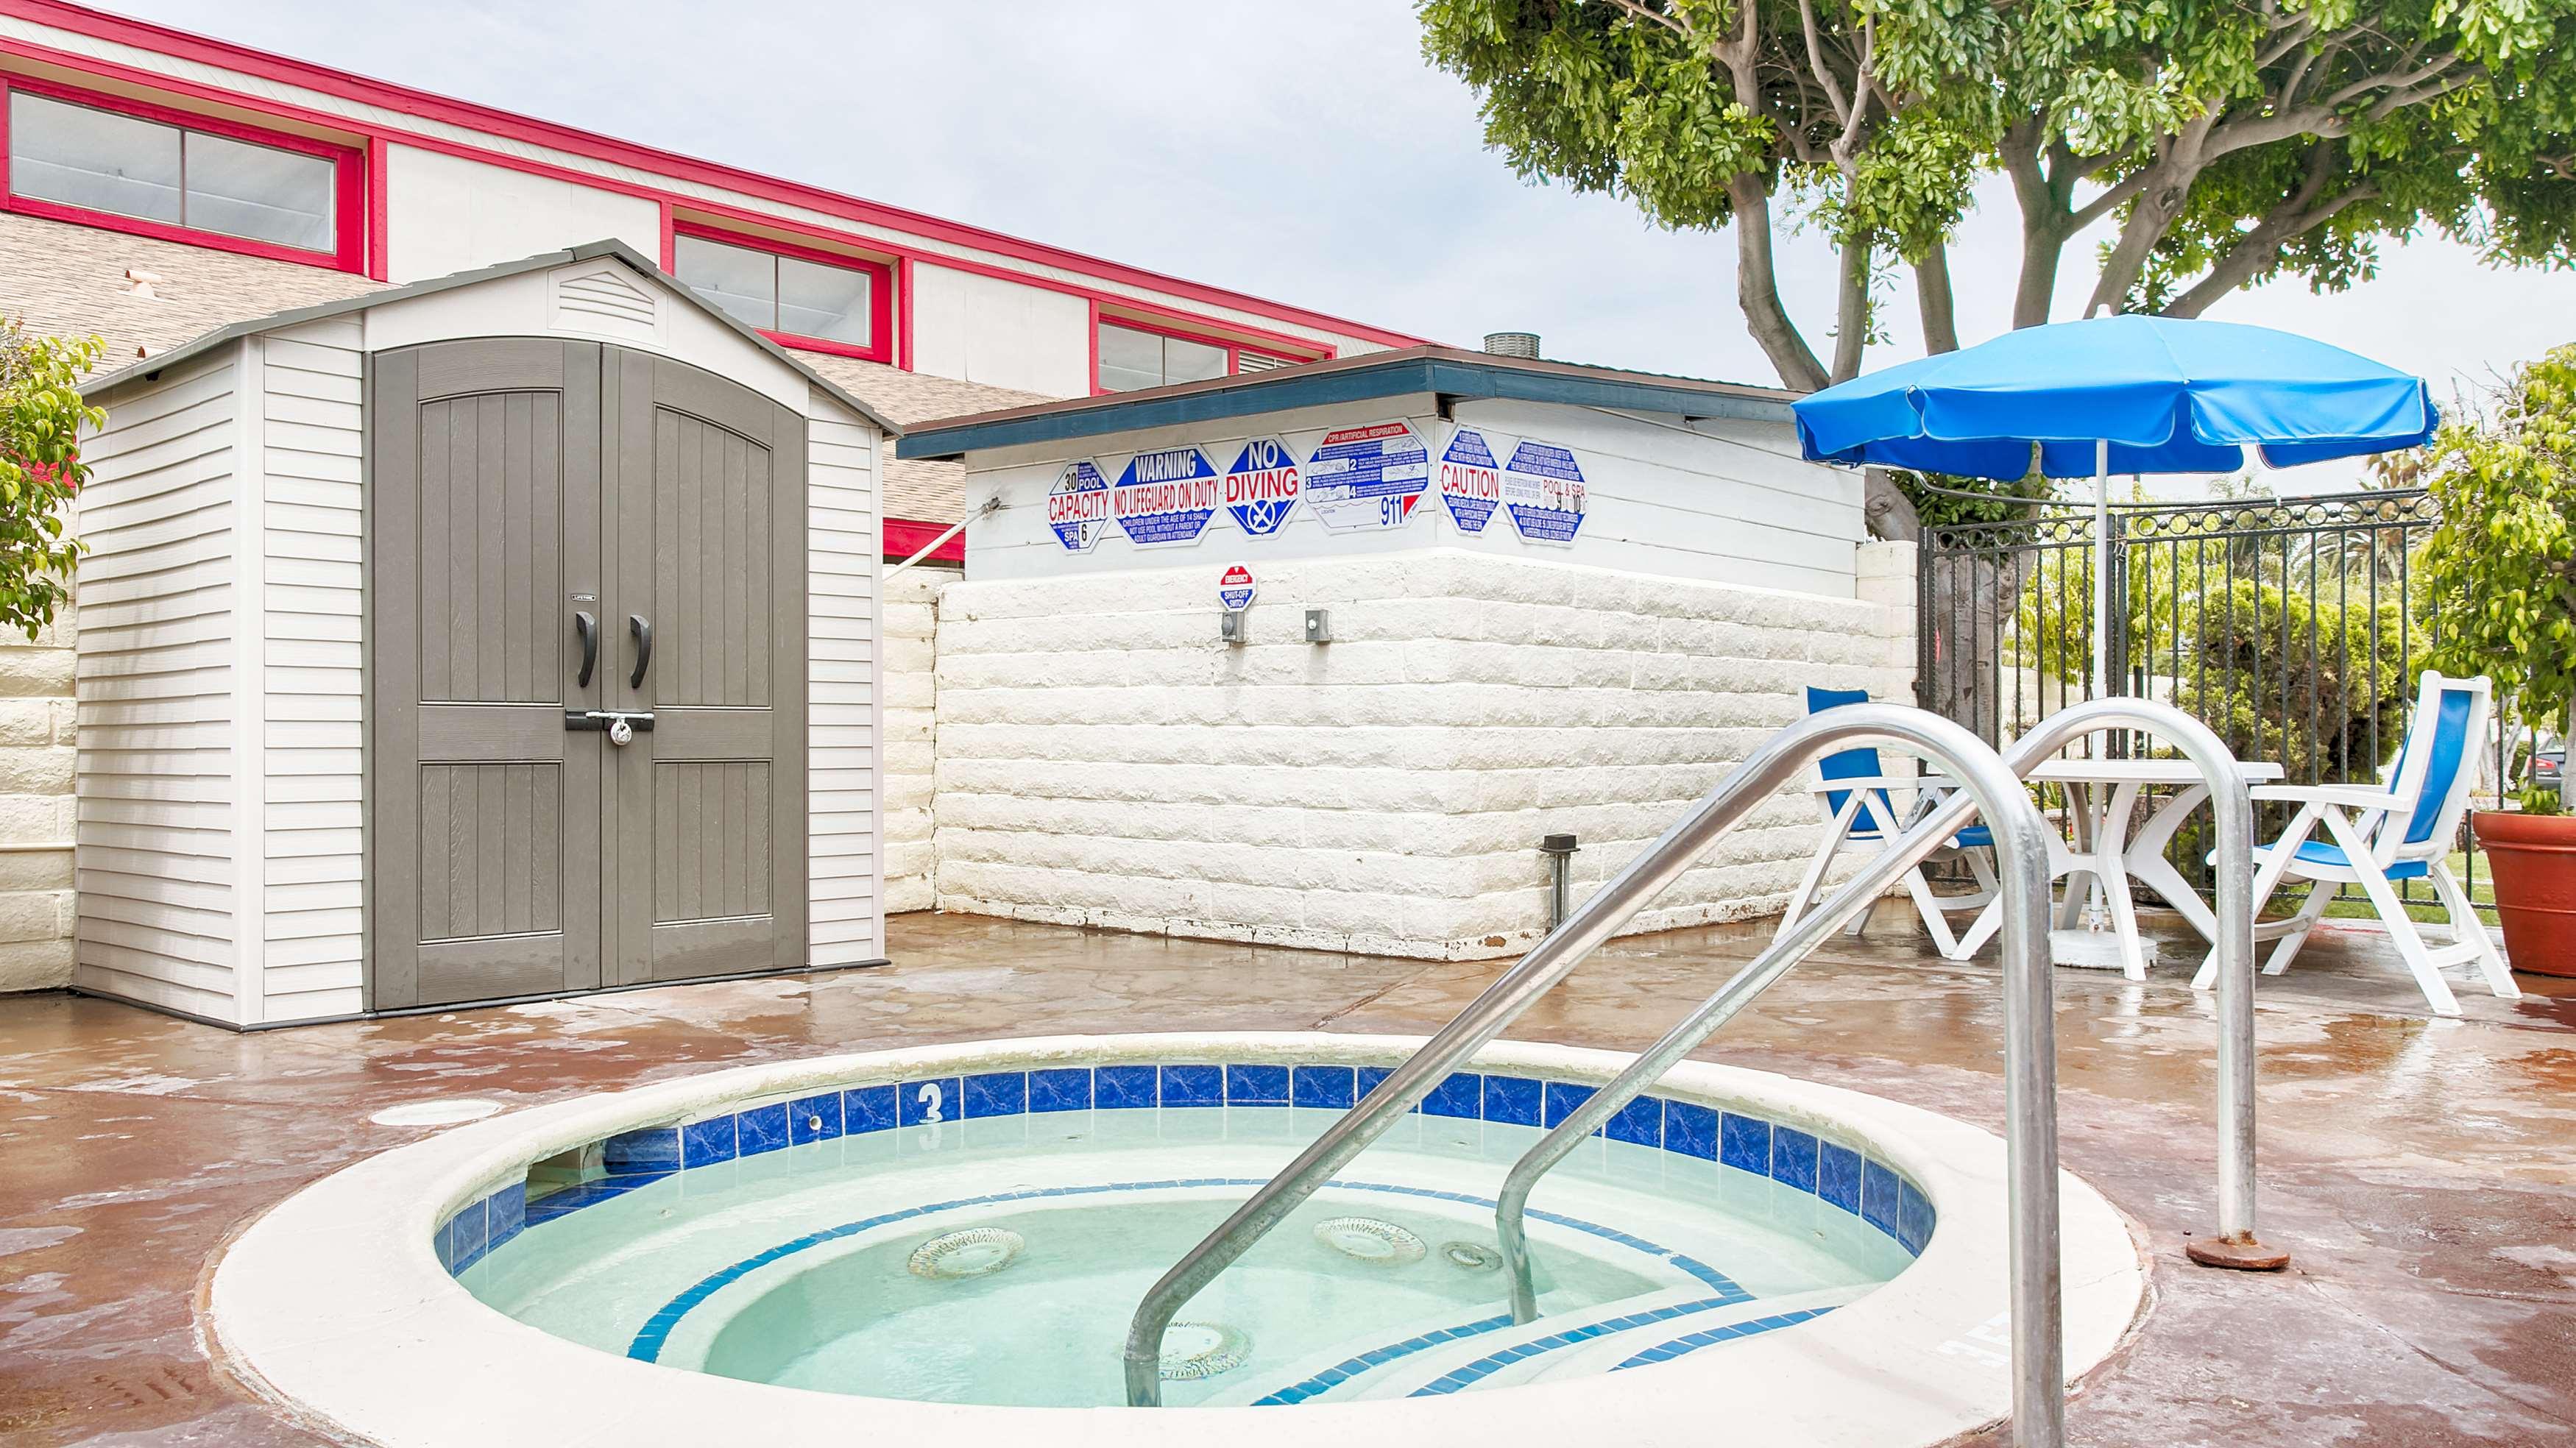 50 reviews of Huntington Surf Inn